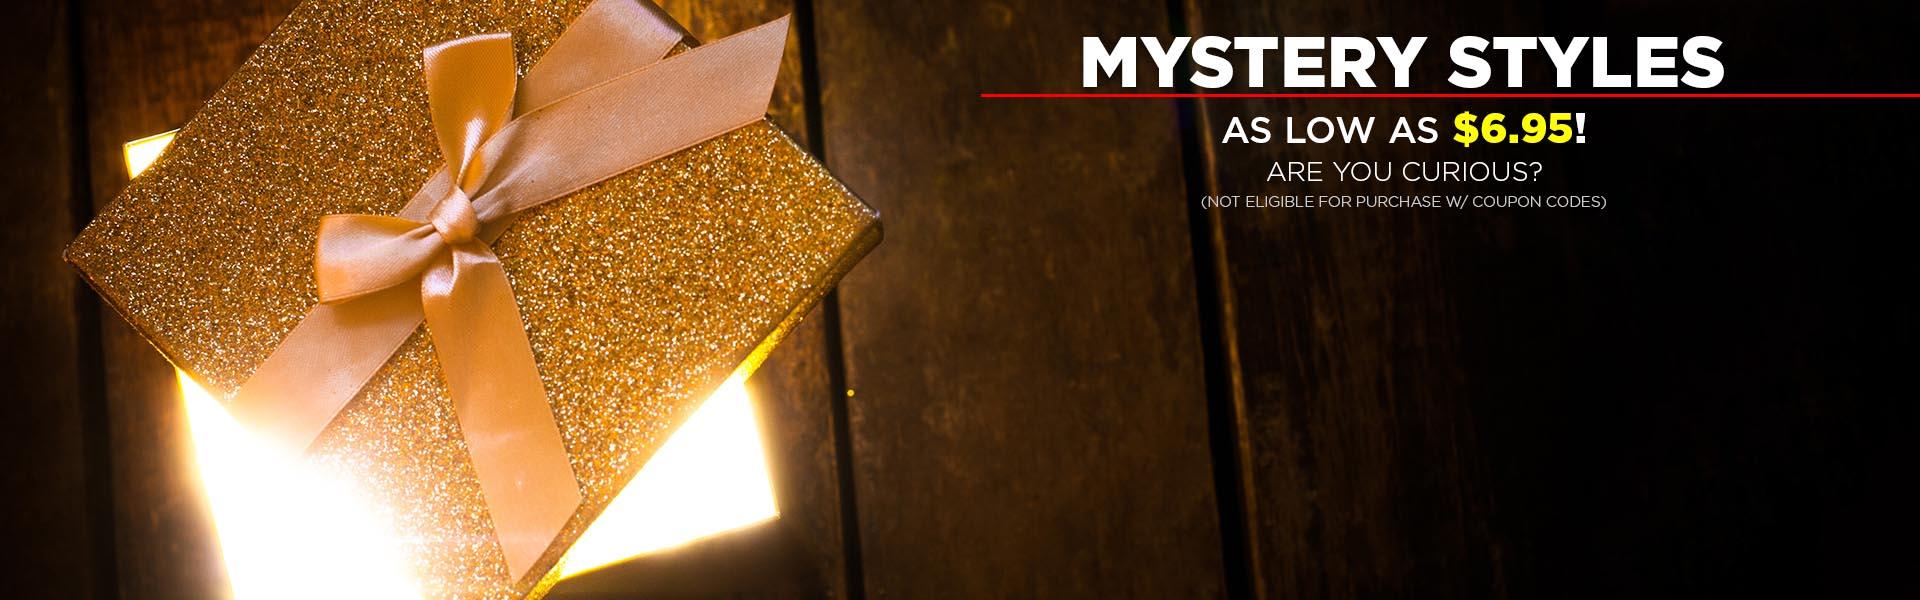 MYSTERY STYLES